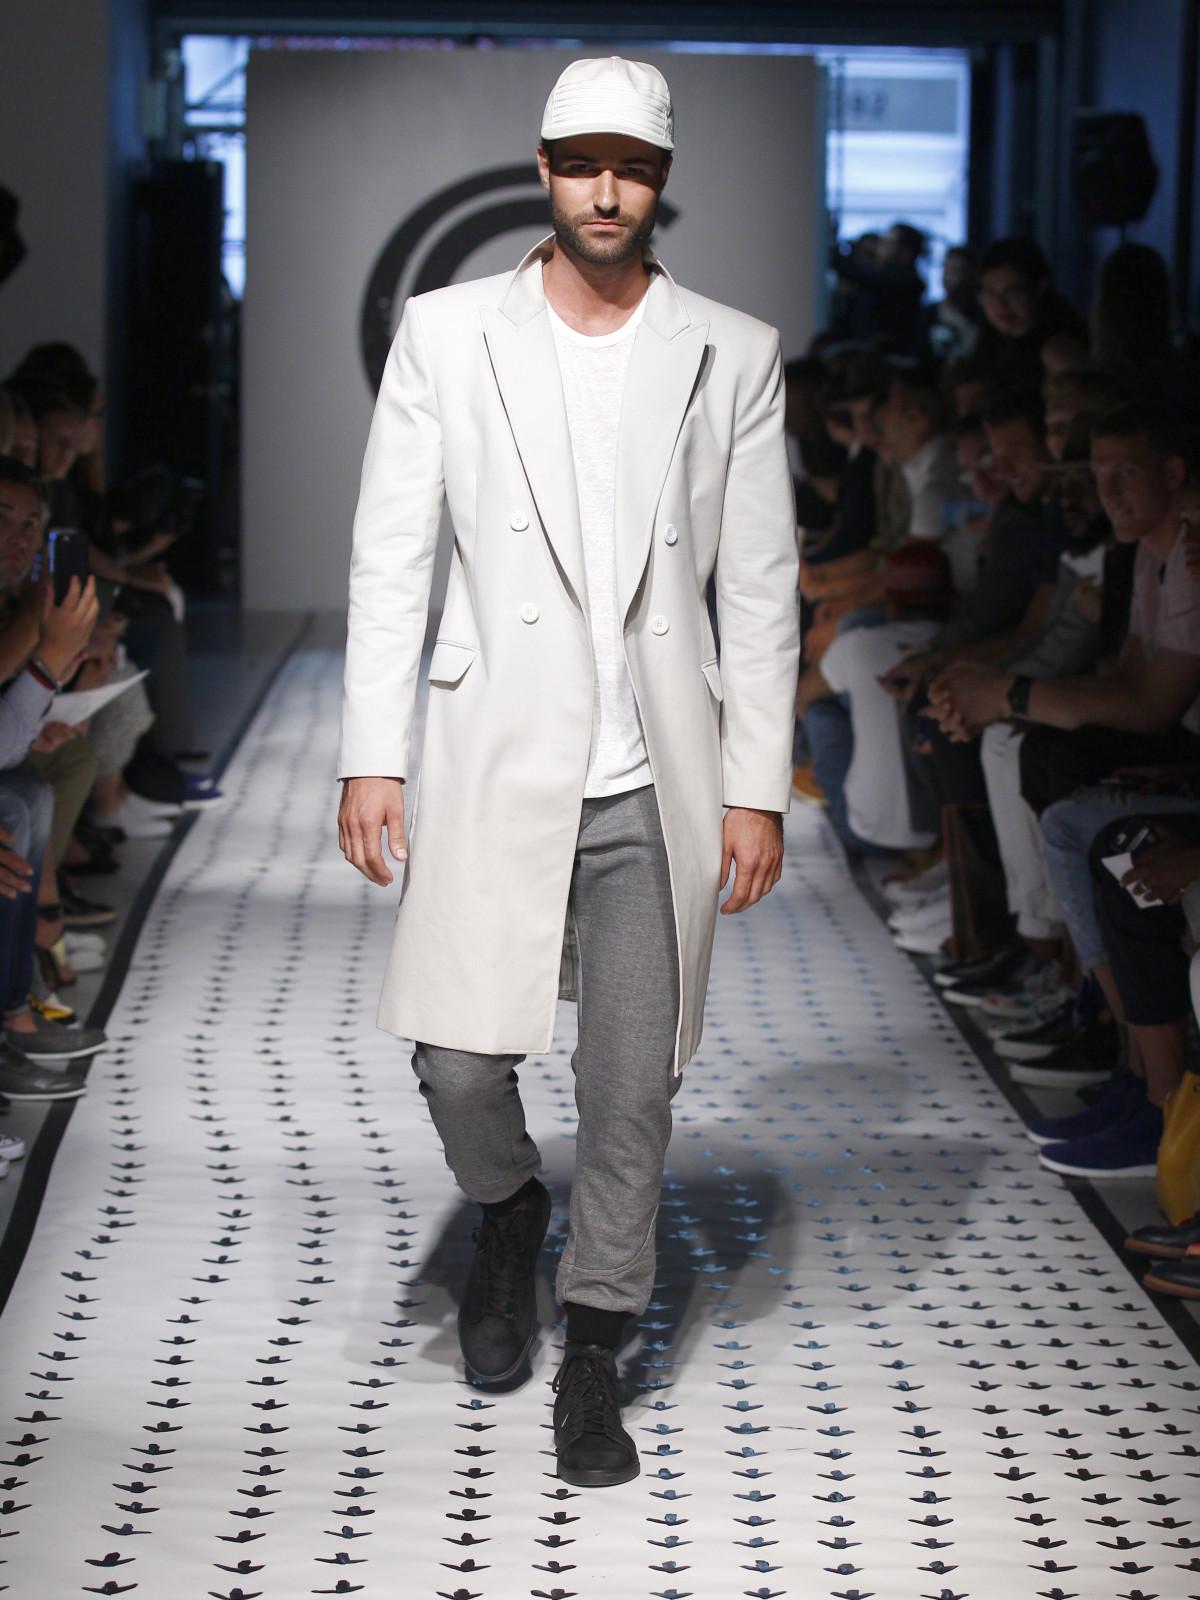 New York Men's Fashion Week Grungy Gentleman spring summer 2016 coat